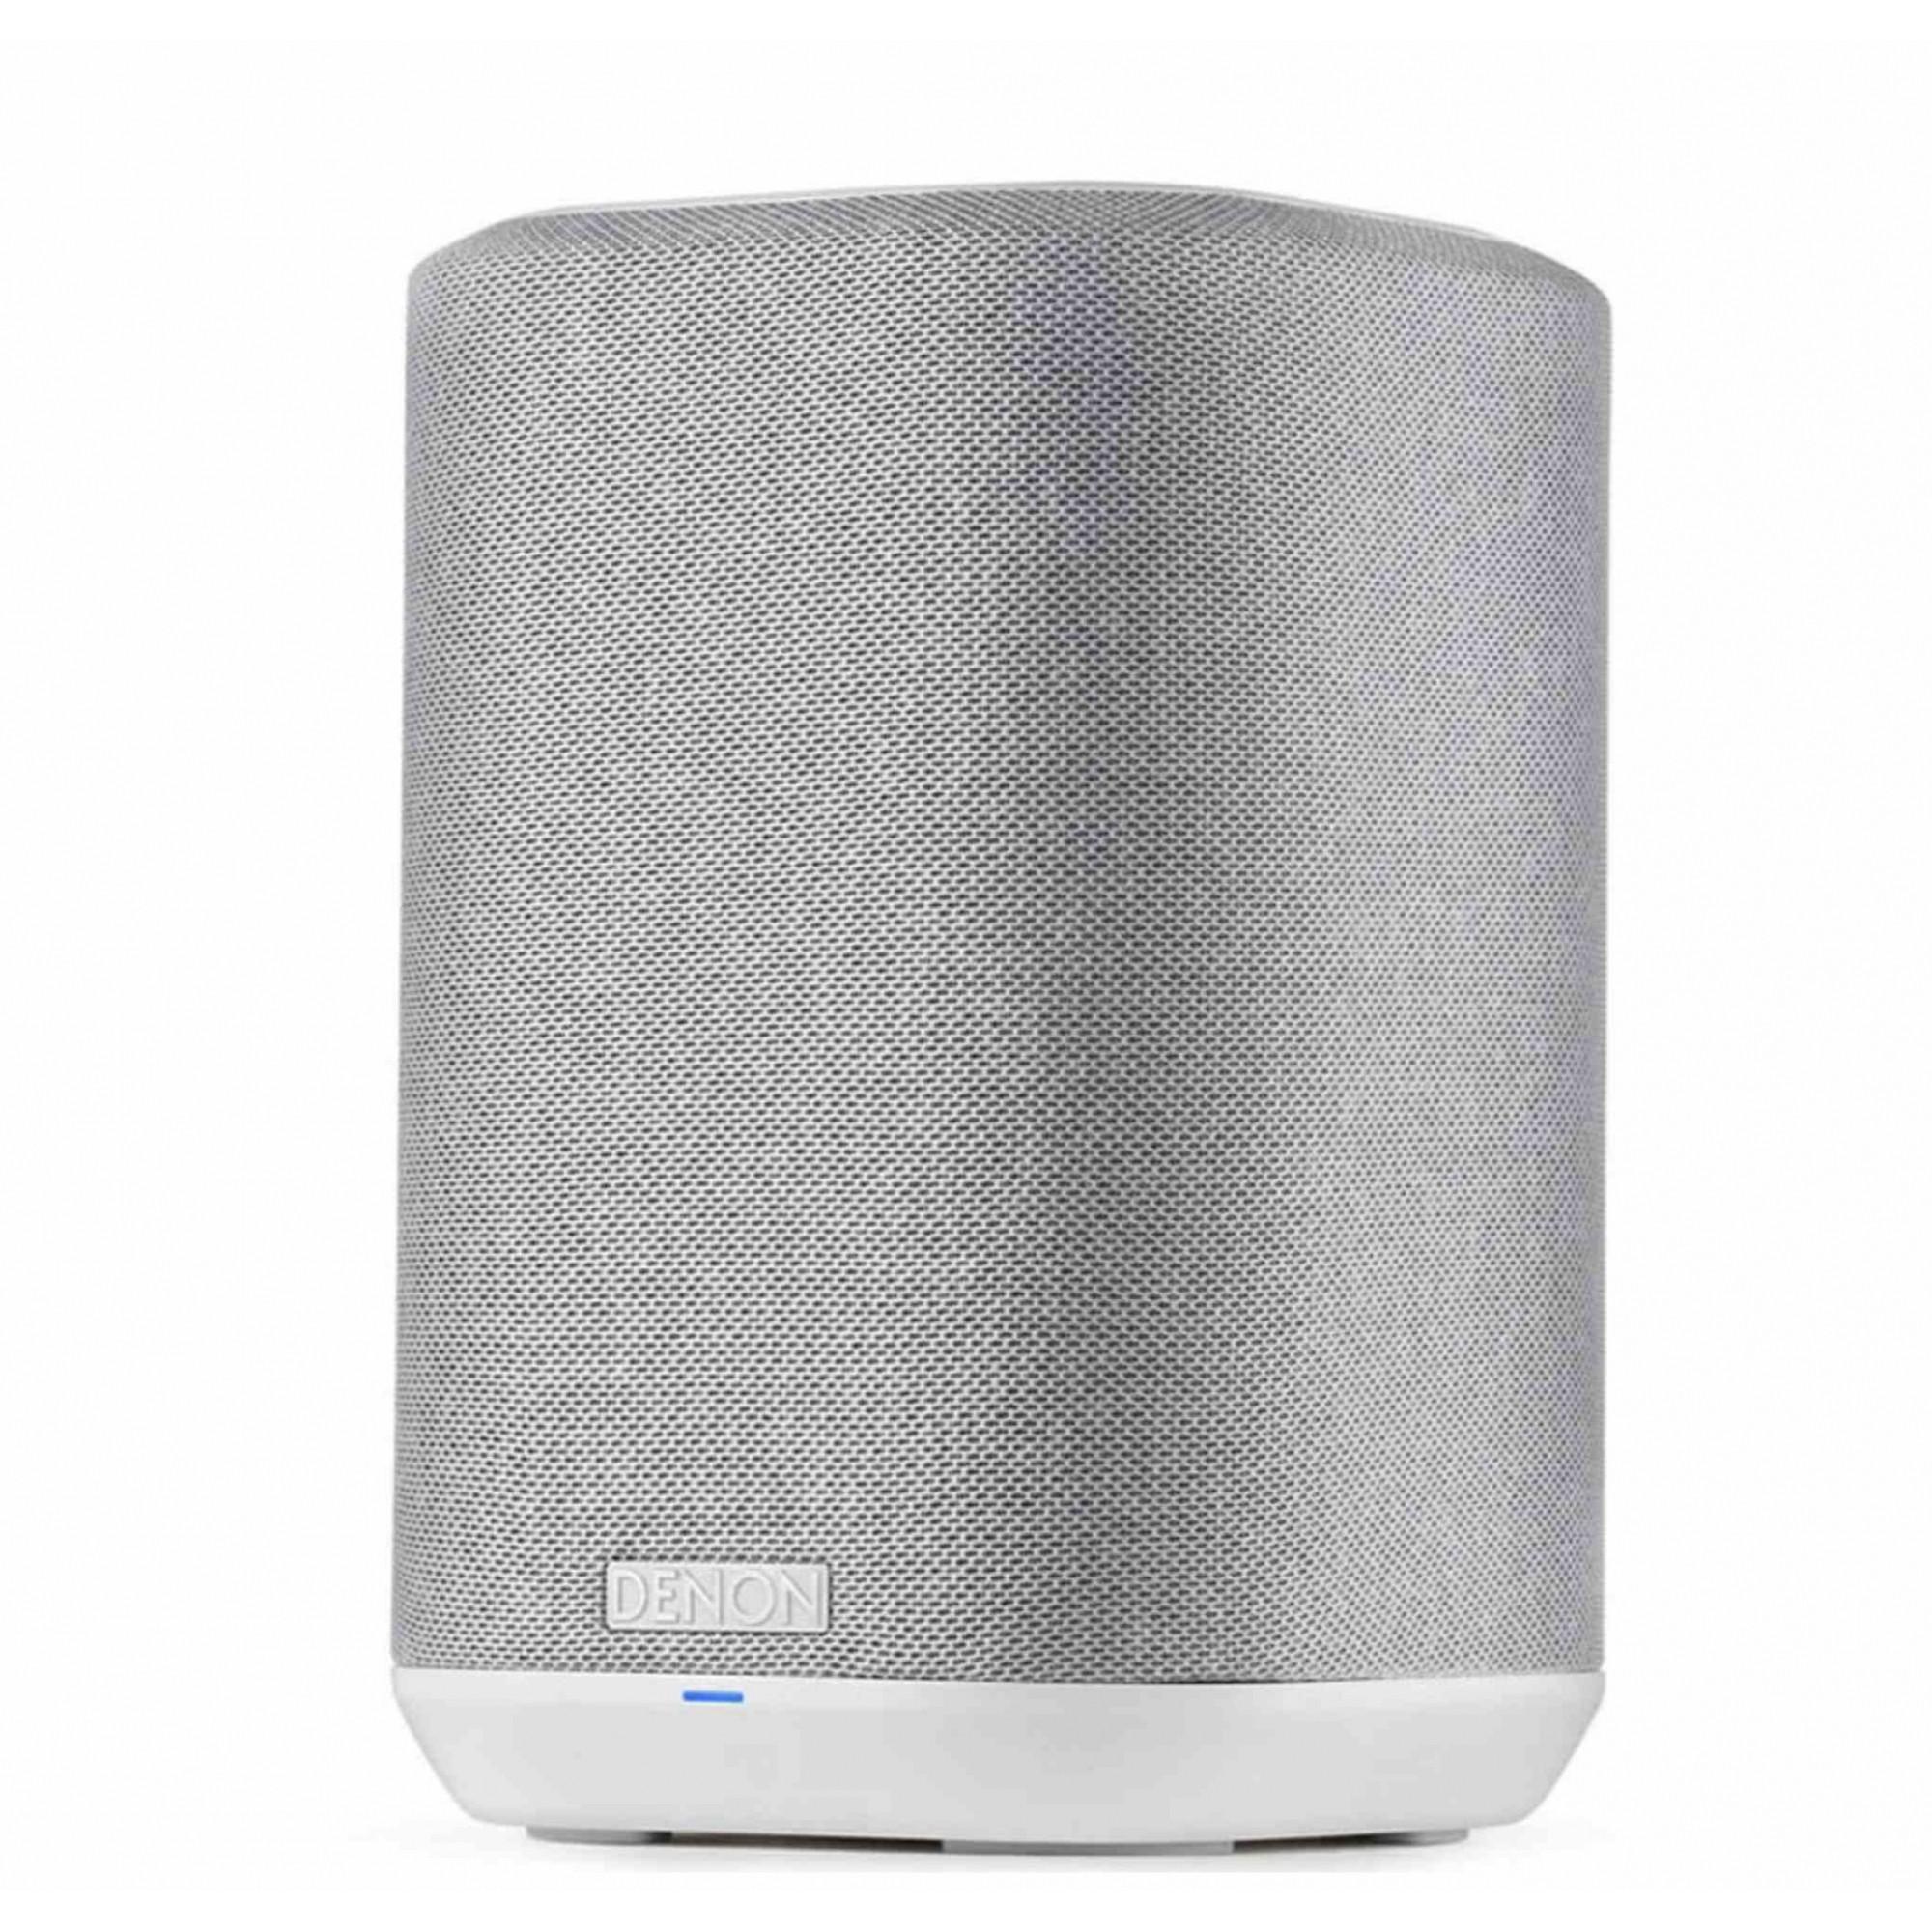 Denon Home 150 Caixa  Wireless ( Branco )